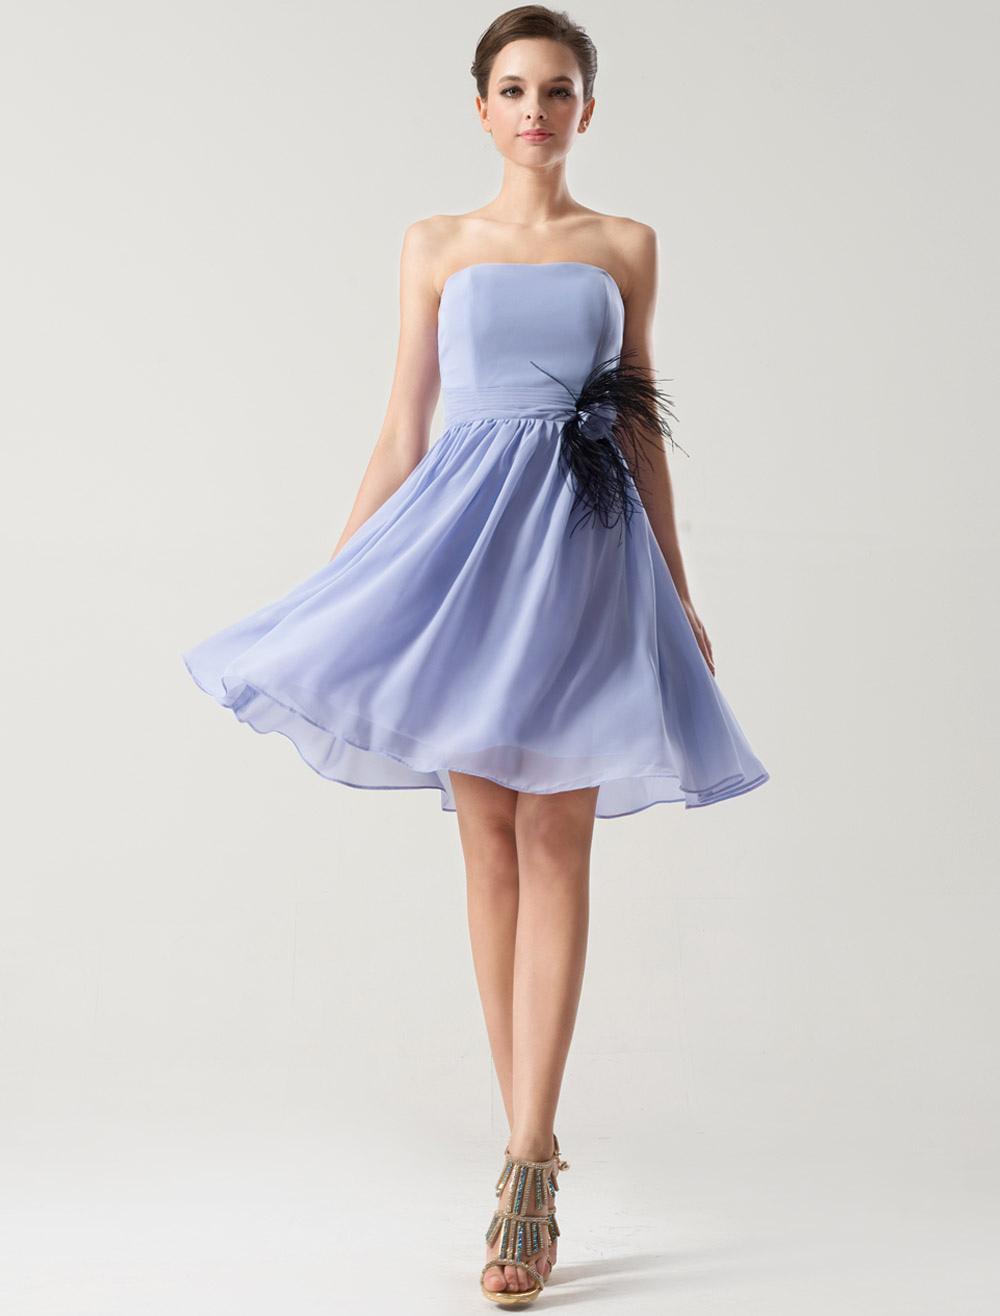 Lavender Chiffon Short Bridesmaid Dress wirh Feather